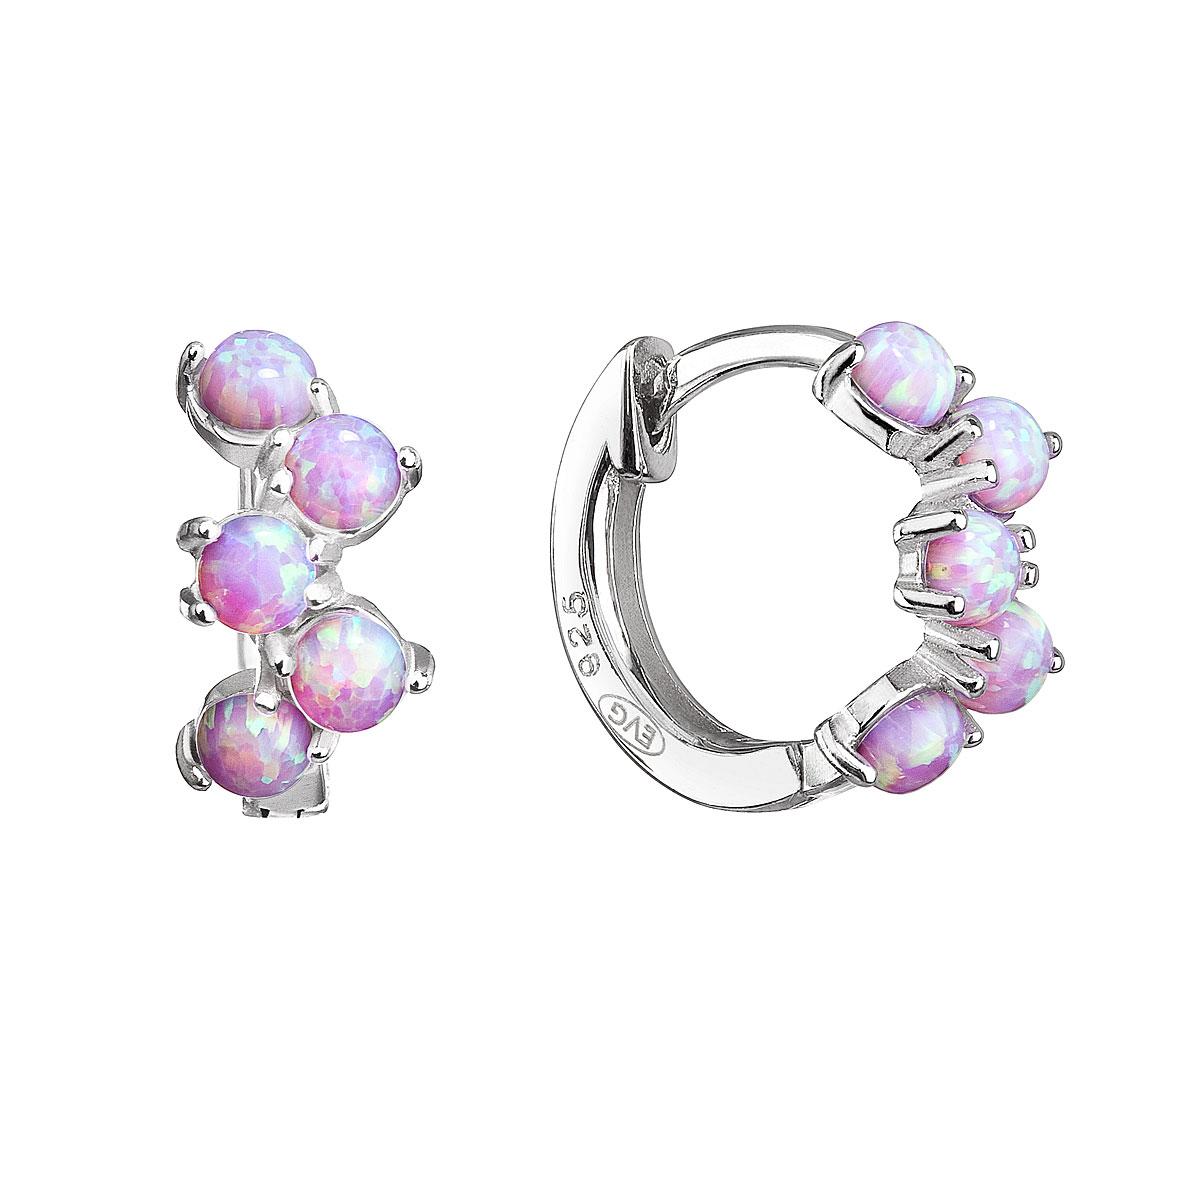 Strieborné náušnice kruhy so syntetickými opálmi ružové 11339.3